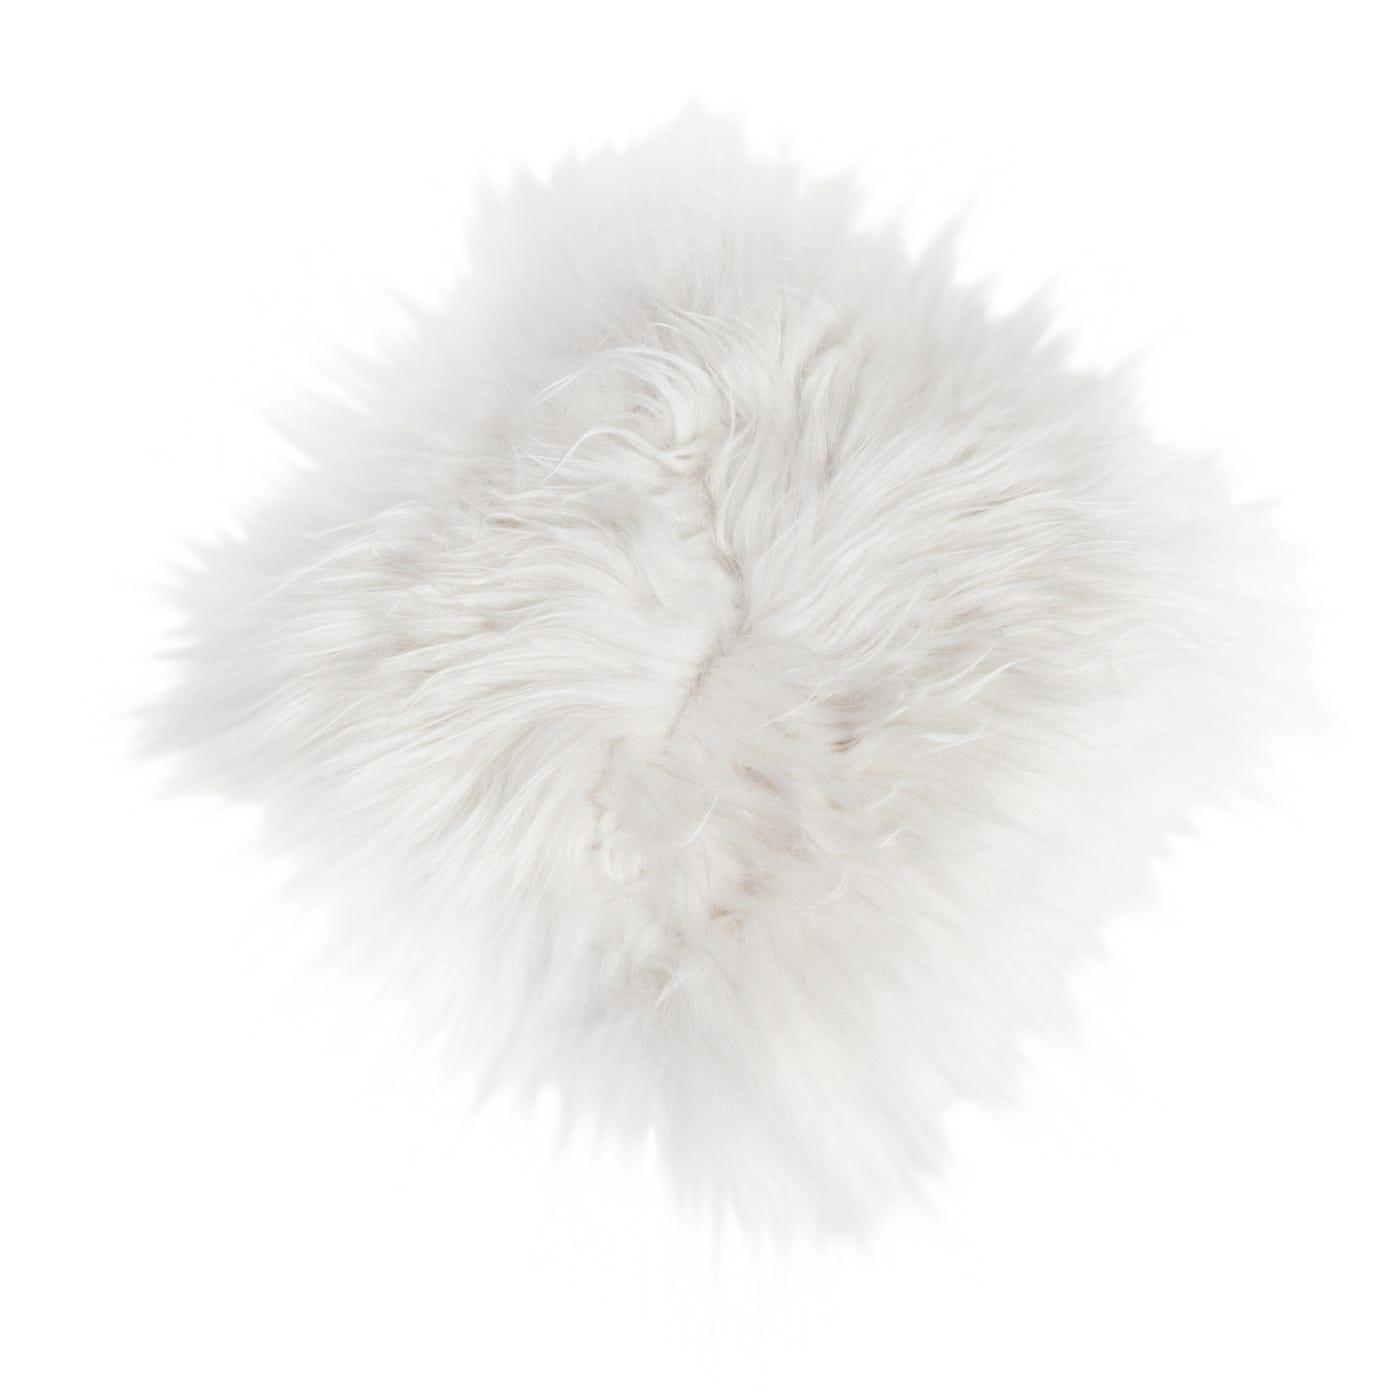 Icelandic Sheepskin Chair Pad – White Chair Pad